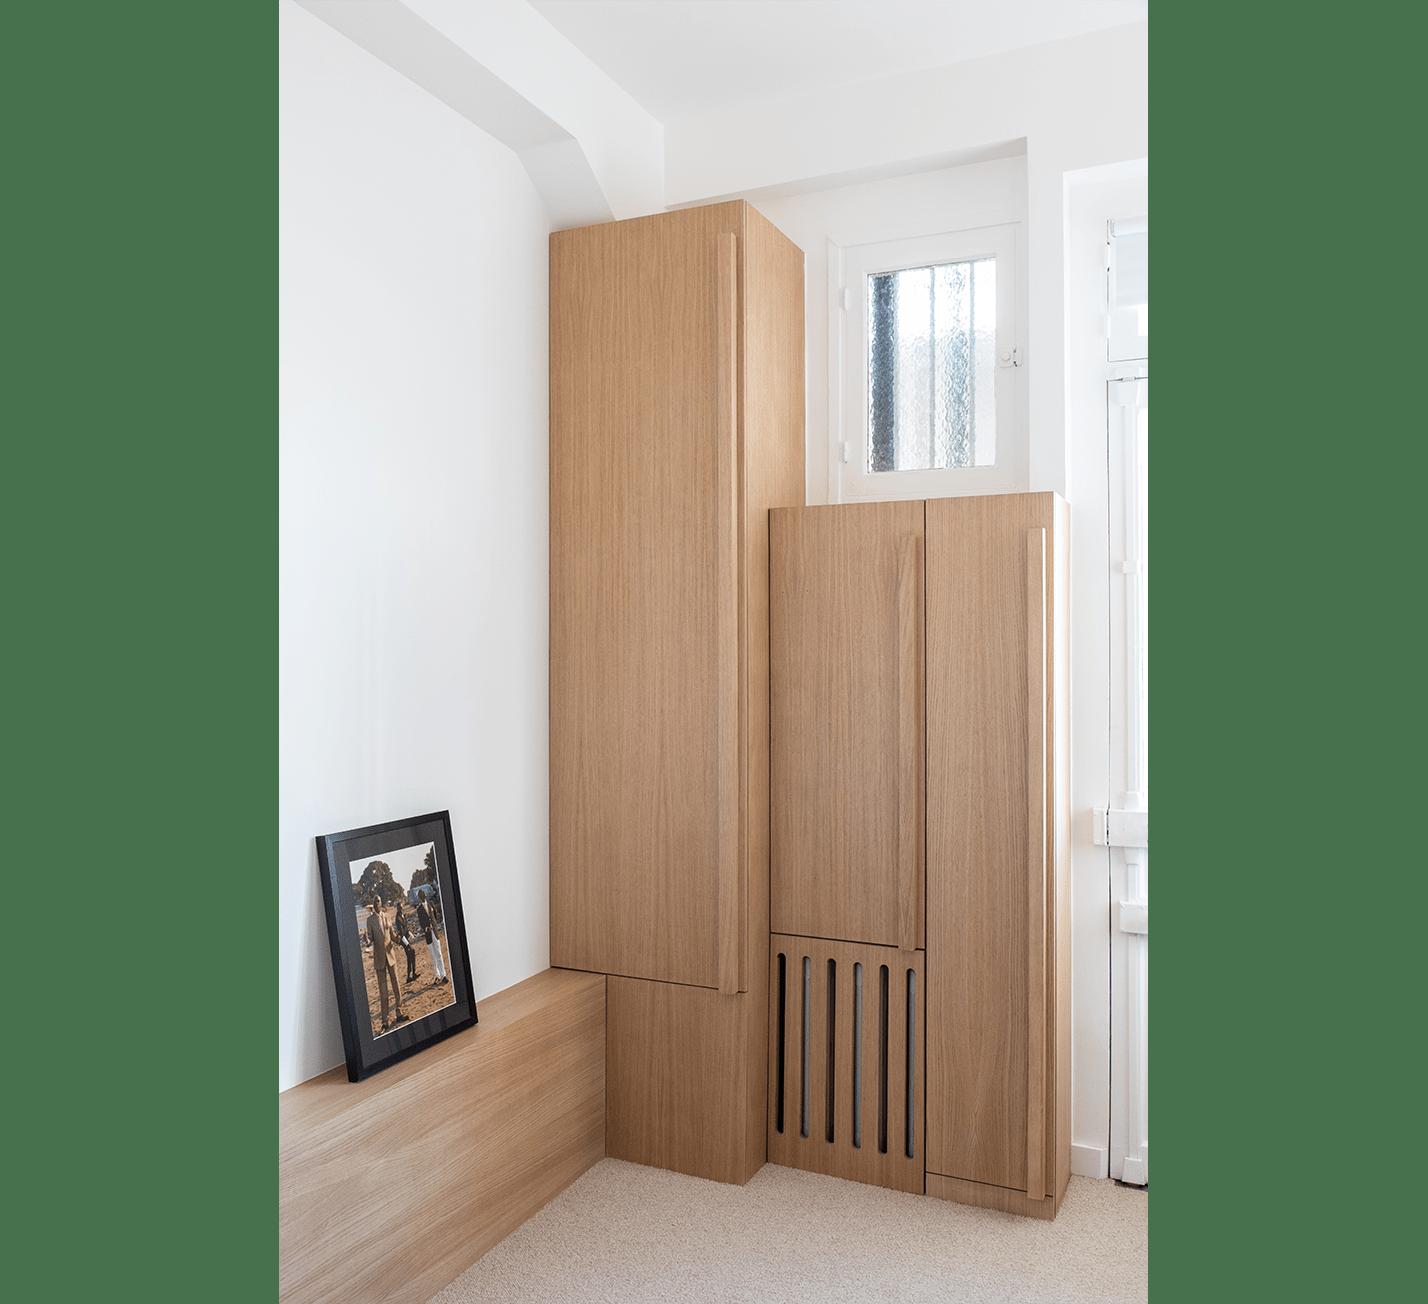 Projet-Emile-Atelier-Steve-Pauline-Borgia-Architecte-interieur-16-min